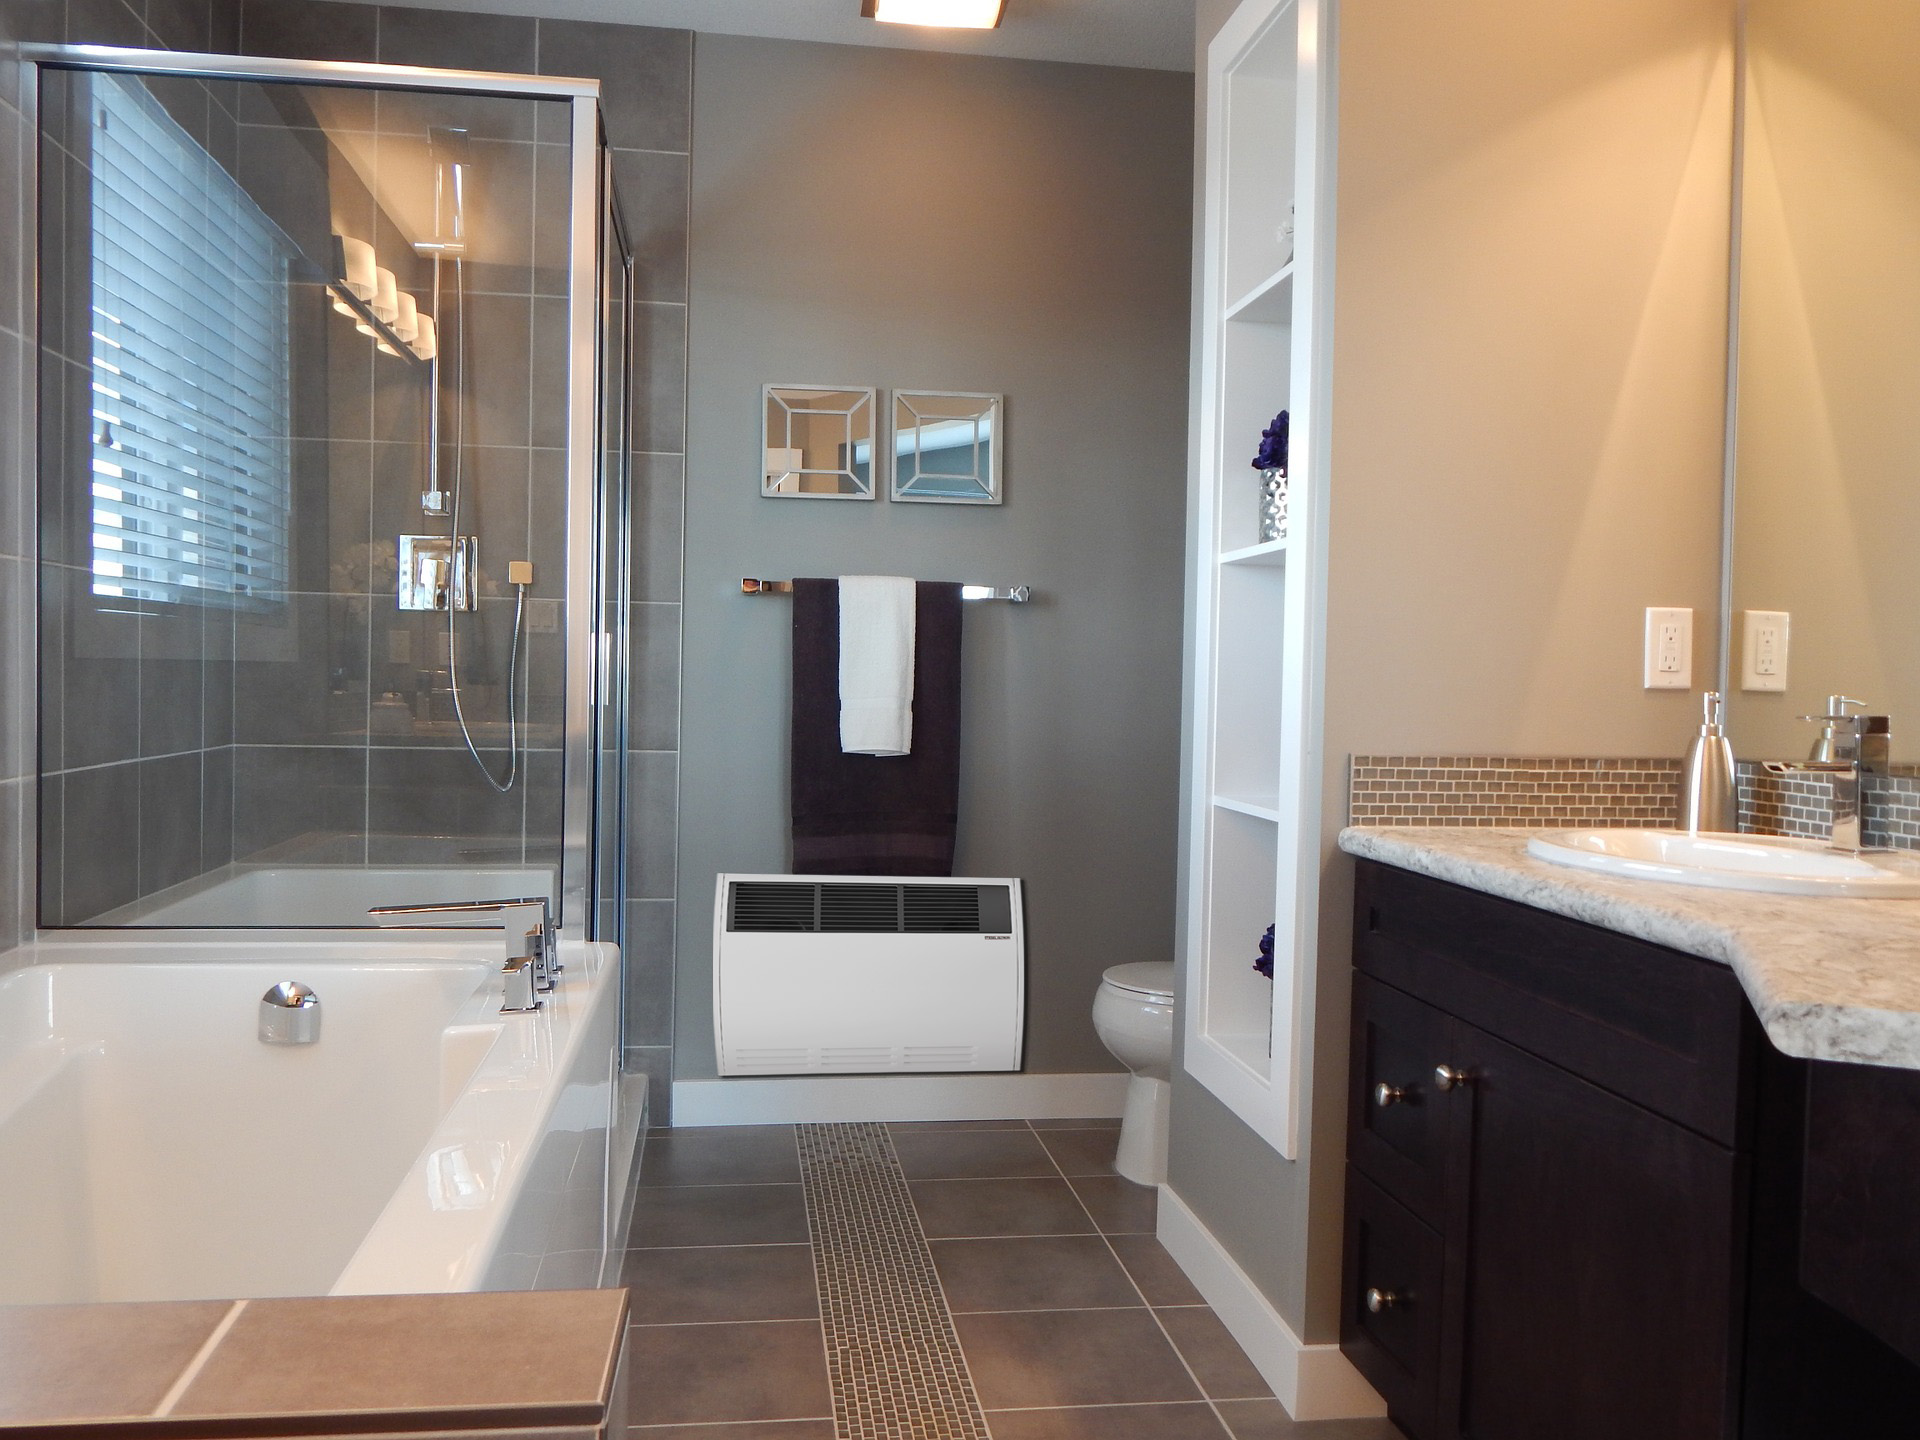 stiebel eltron con 10 s heizger te konvektor heizung ofen elektro heizk rper ebay. Black Bedroom Furniture Sets. Home Design Ideas